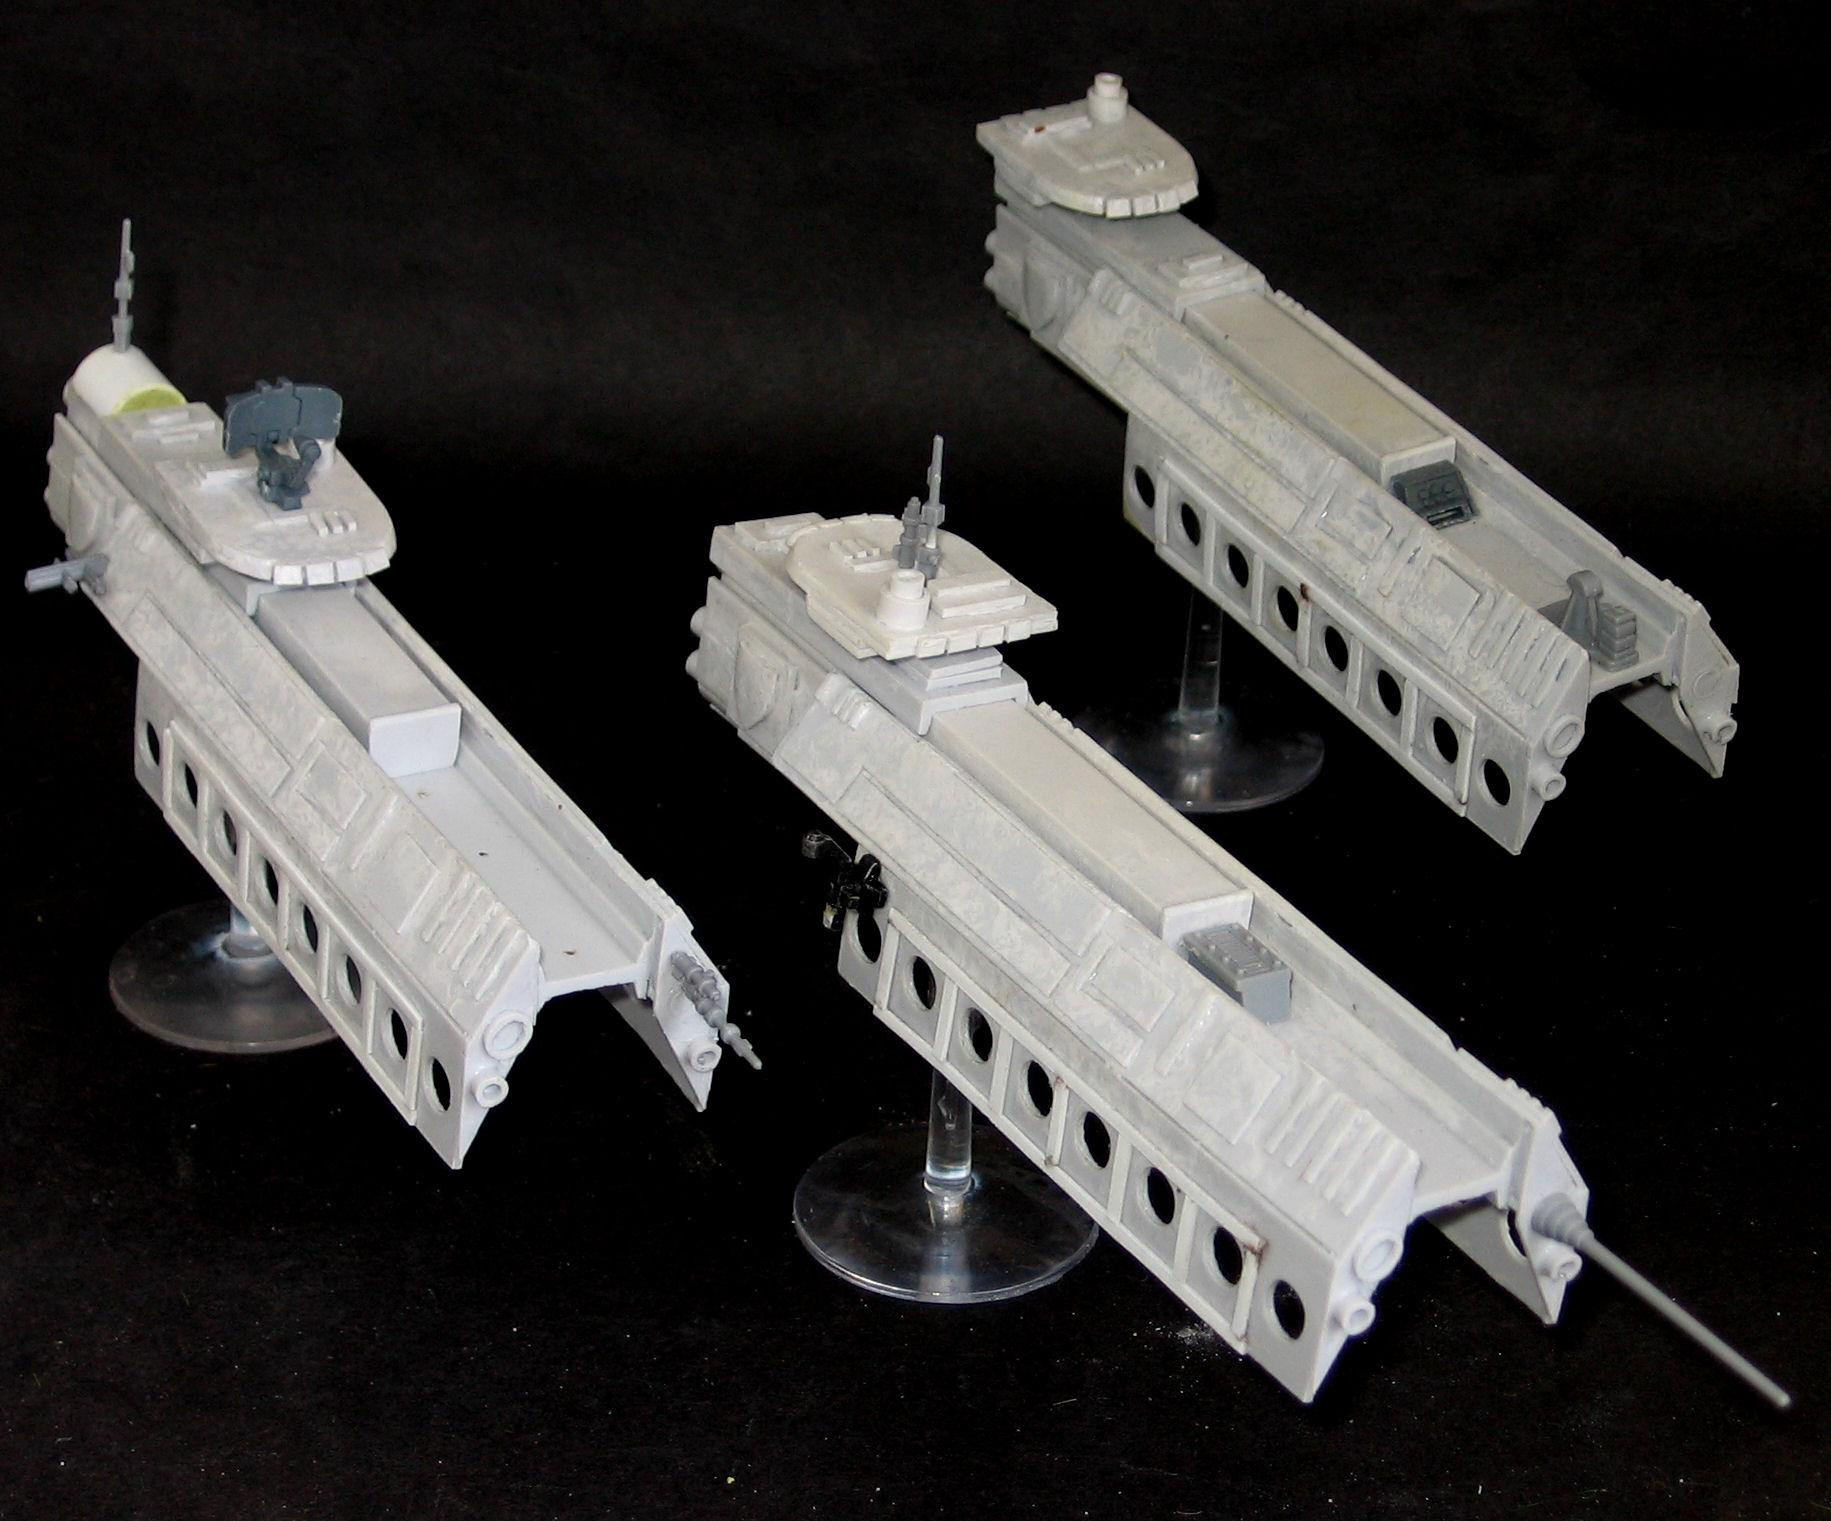 Battlefleet Gothic, Fleet, Gothic, Omega, Precinctomega, Scratch Build, Sculpting, Starships, Transport